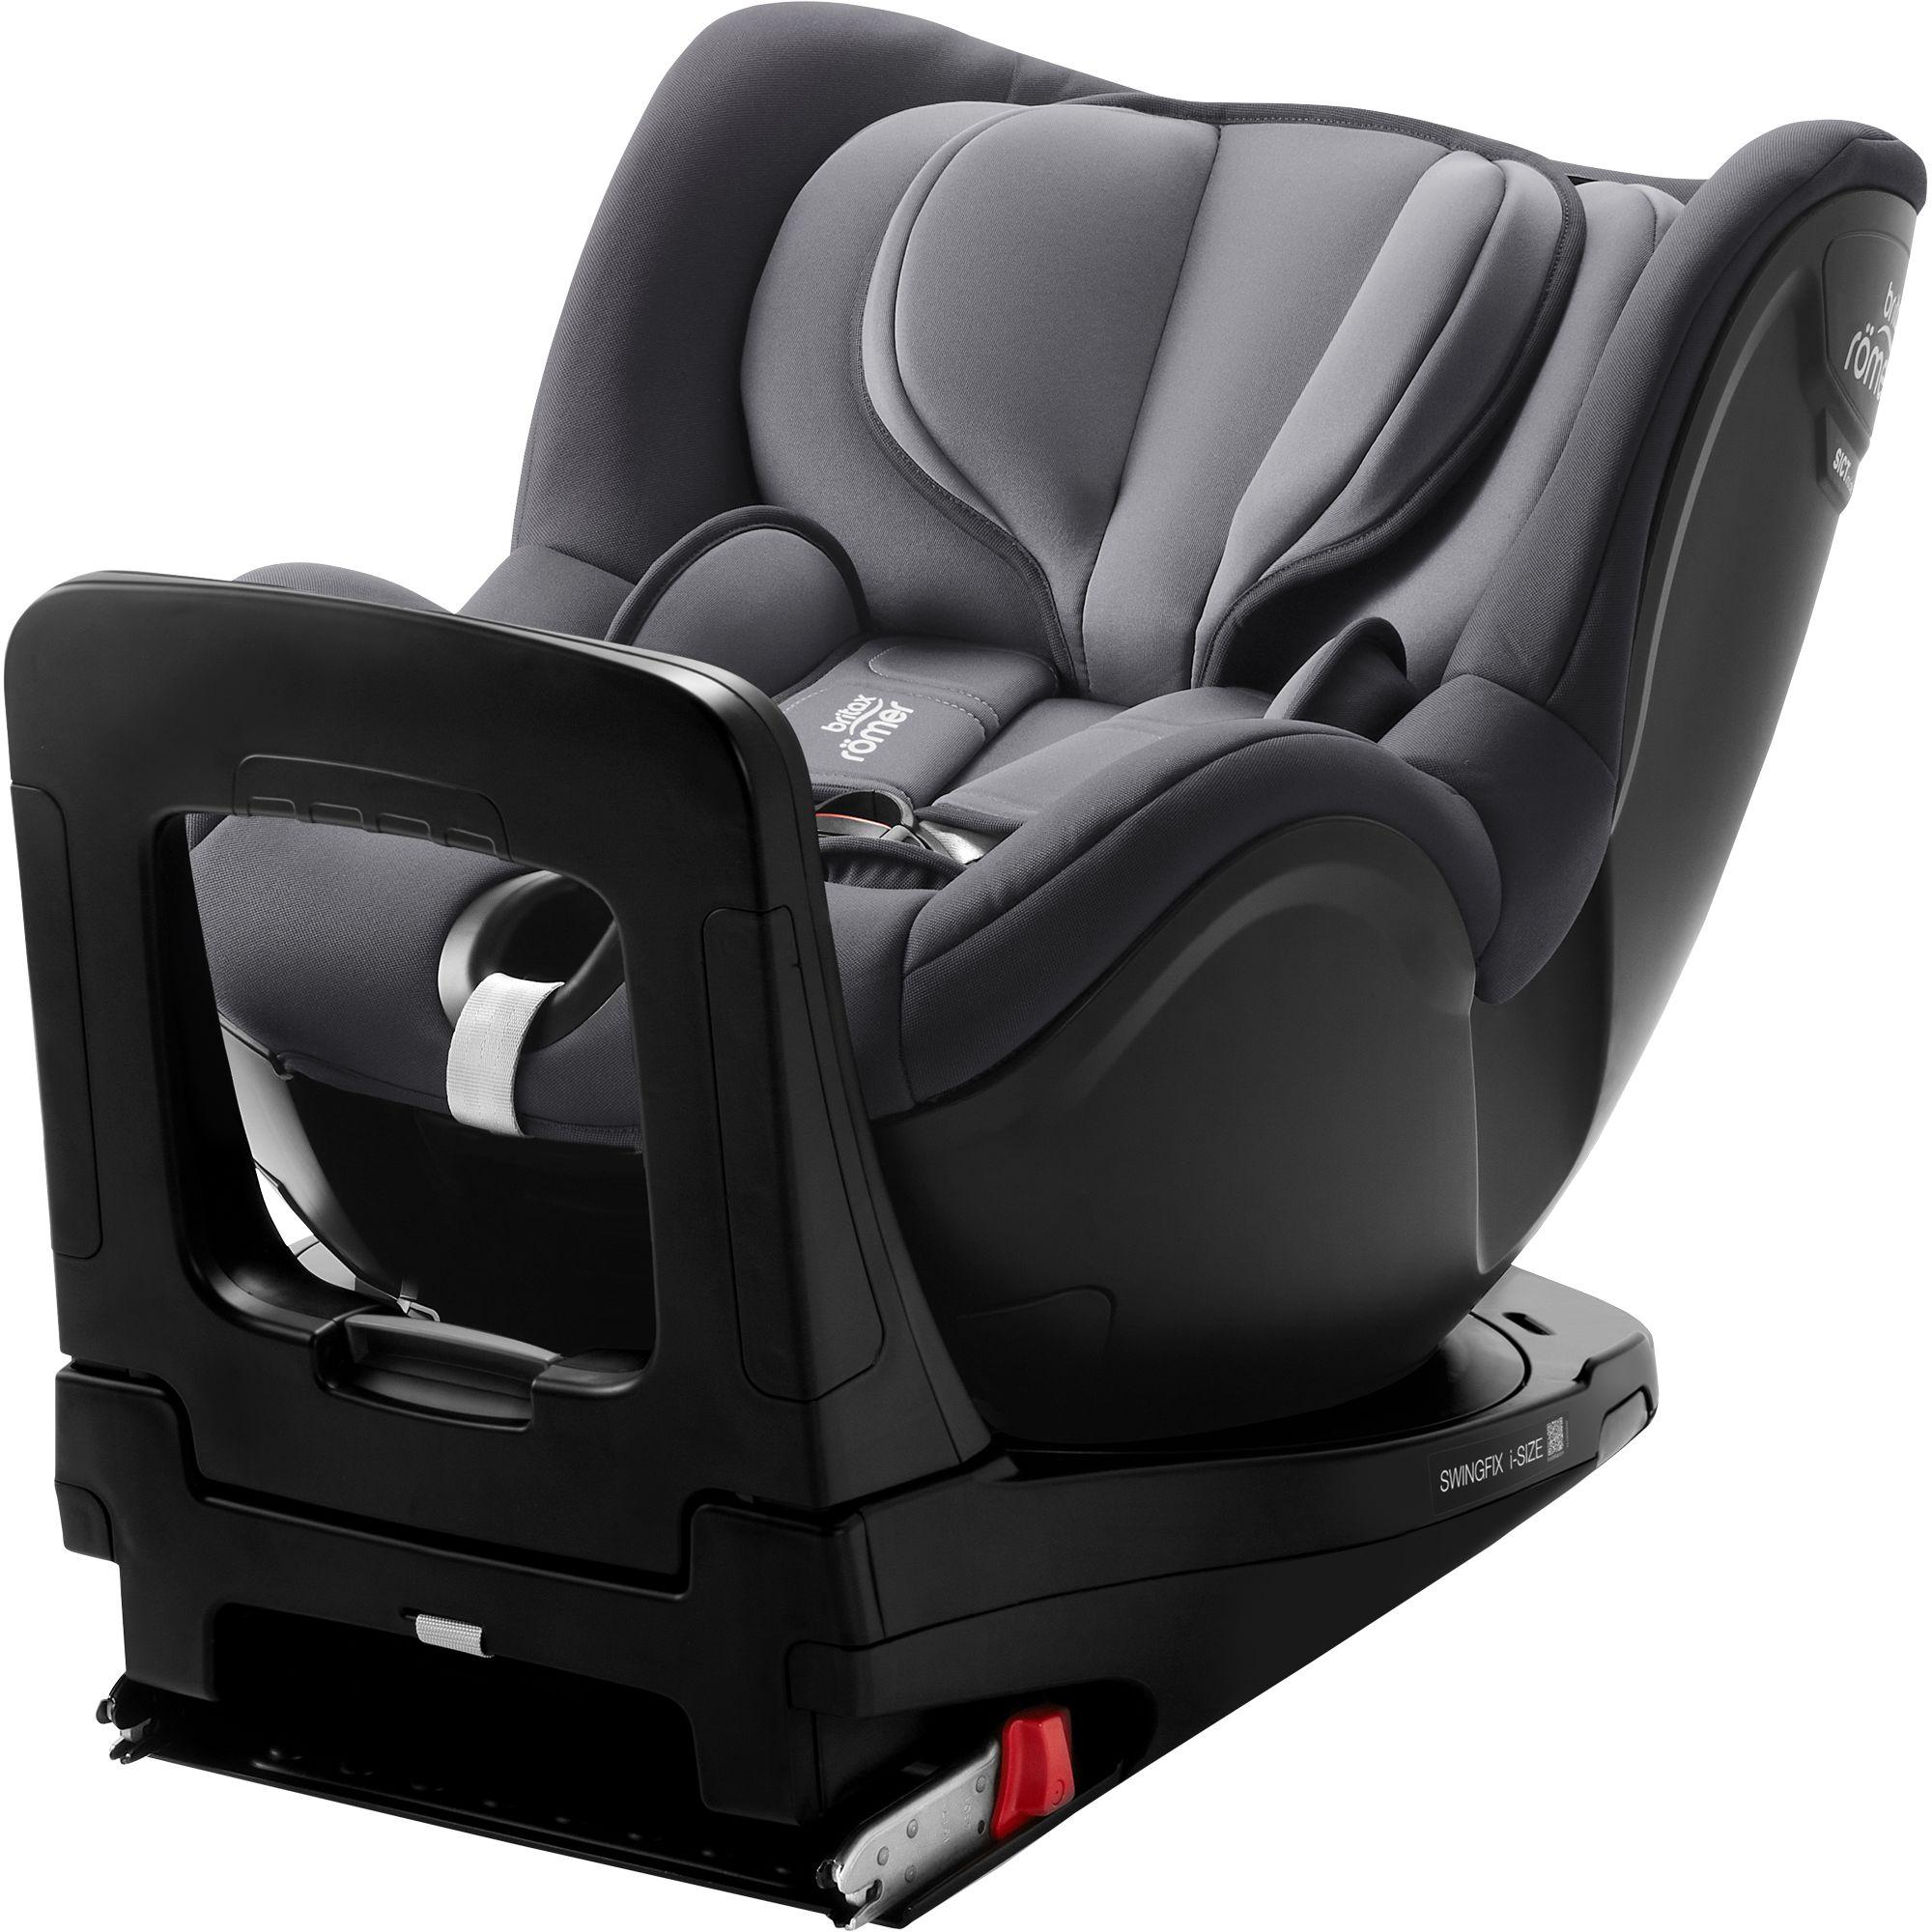 ROMER Swingfix i-Size Storm Grey 2020